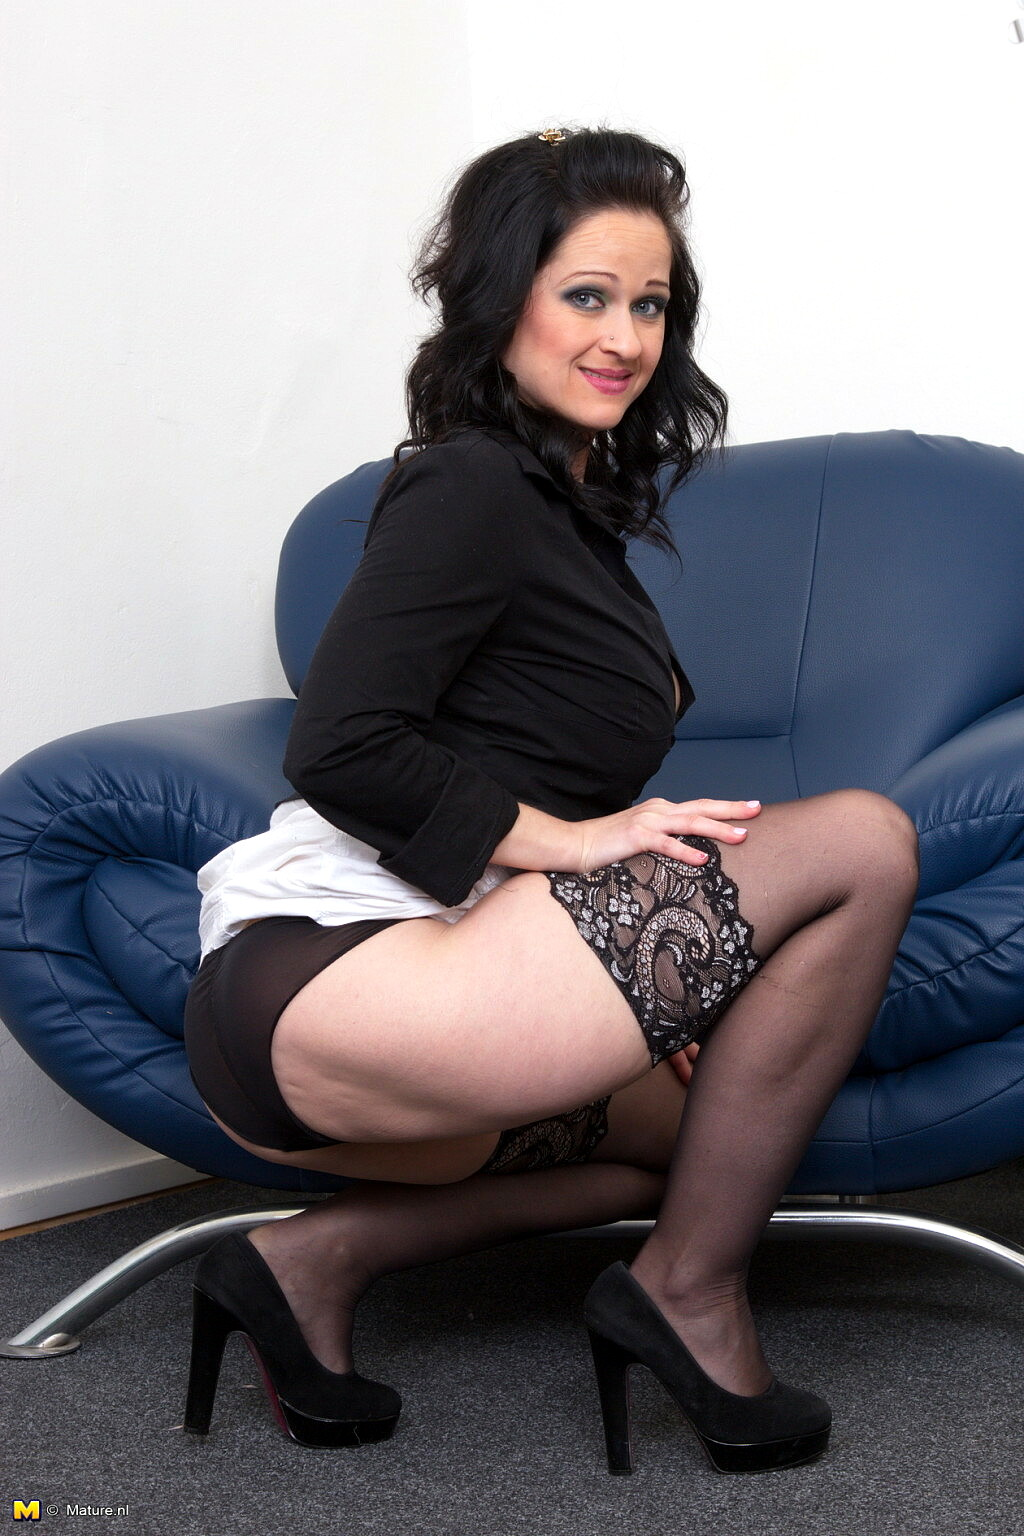 Mature Nl Maturenl Model Goal Brunette Kactuc Sex Hd Pics-4110